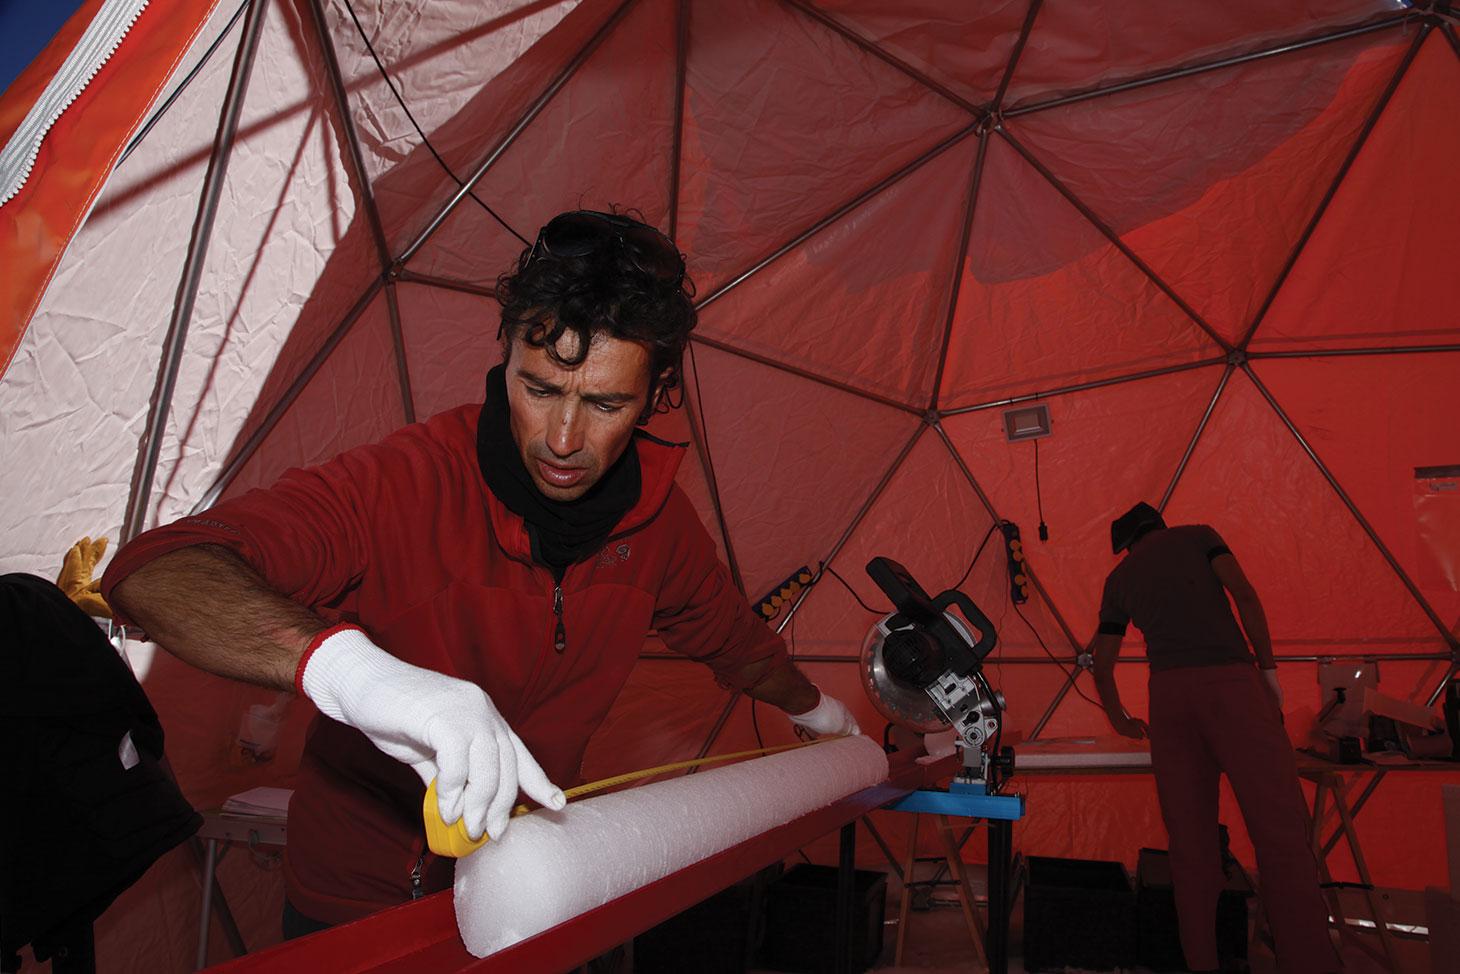 Bruno Jourdain mesure une carotte de glace avant de l'emballer